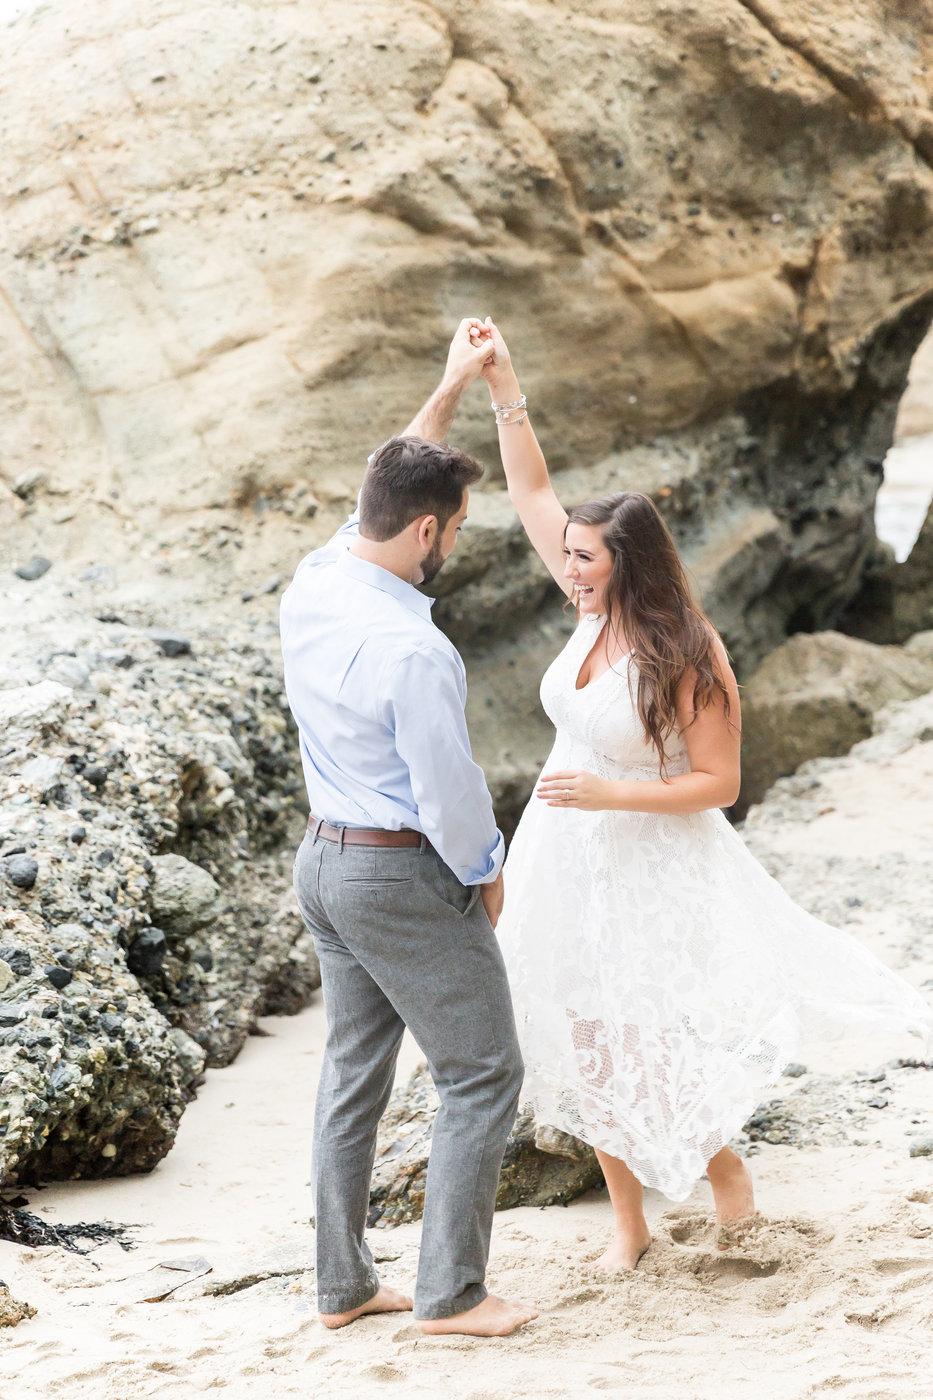 Jenn and Danny engagement-JennandDanny-0042.jpg